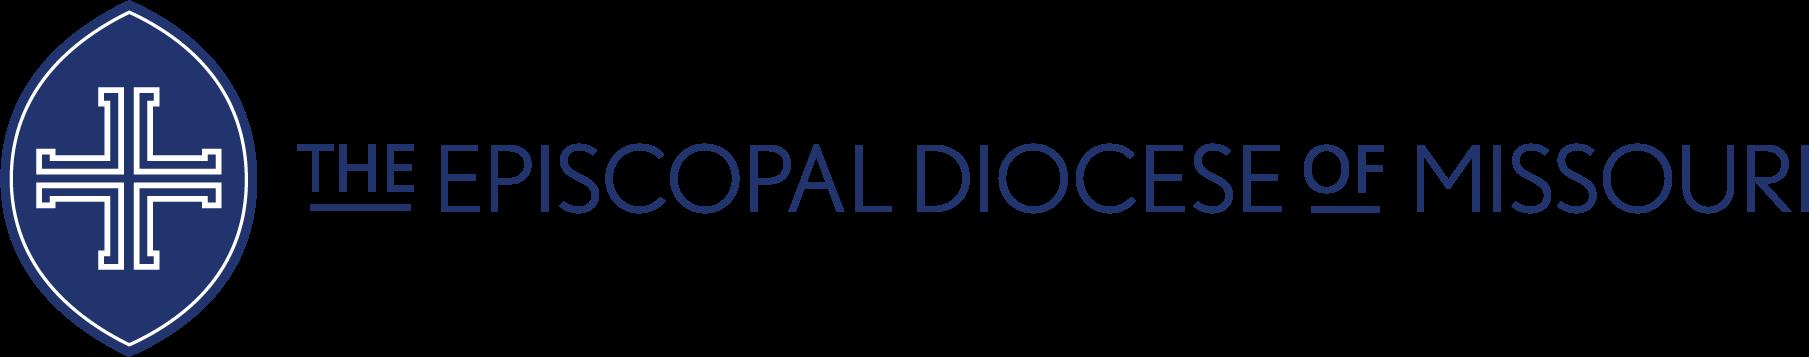 episcopaldiocese-mo-1color-horz-rgb_12